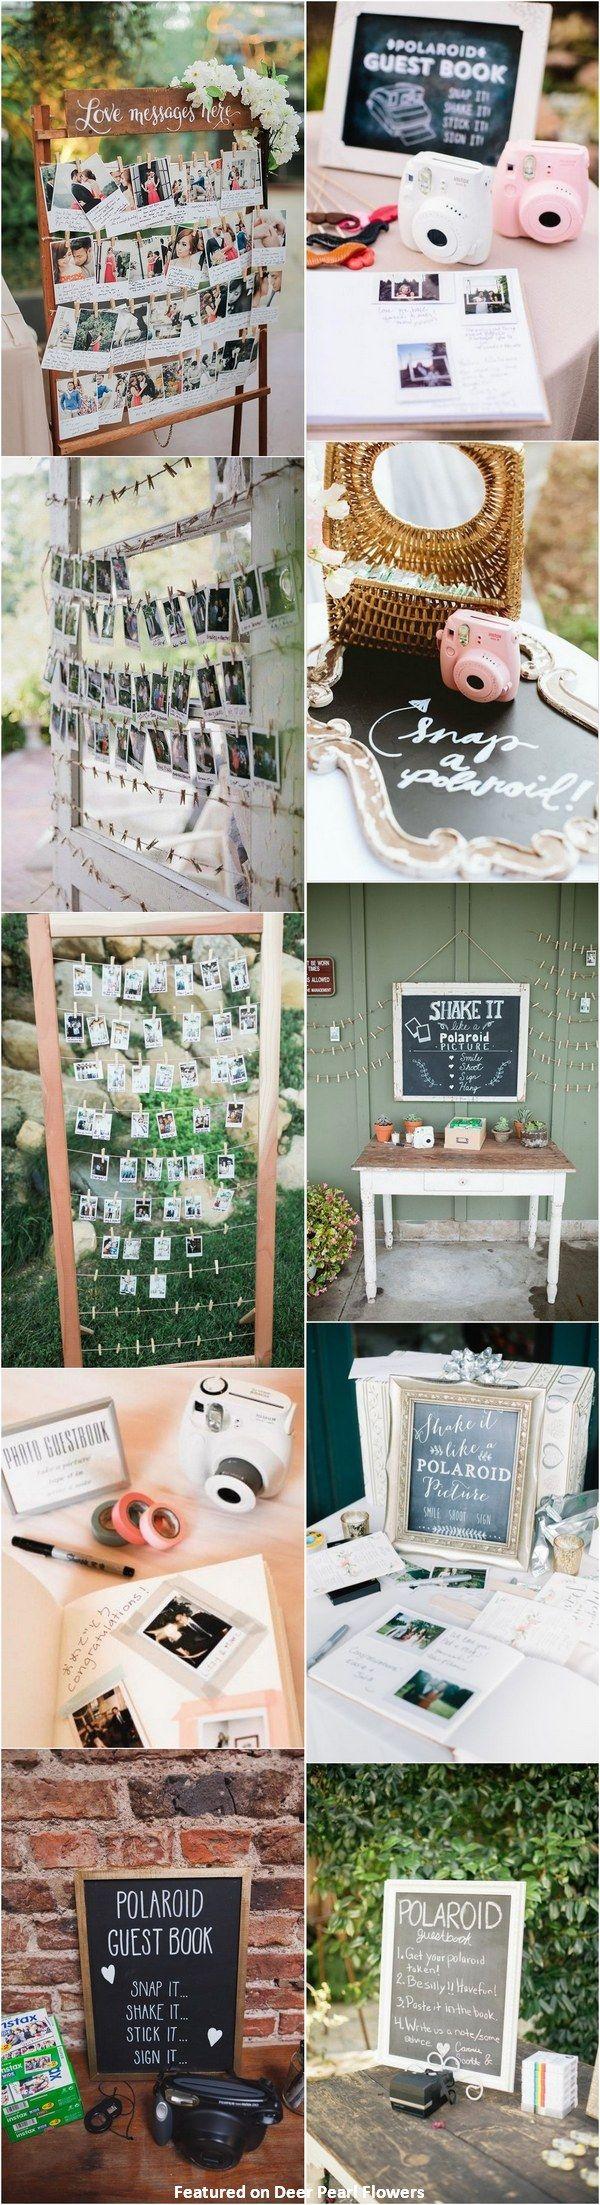 unique wedding ideas - Polaroid wedding guestbook ideas /  http://www.deerpearlflowers.com/creative-polaroid-wedding-ideas/